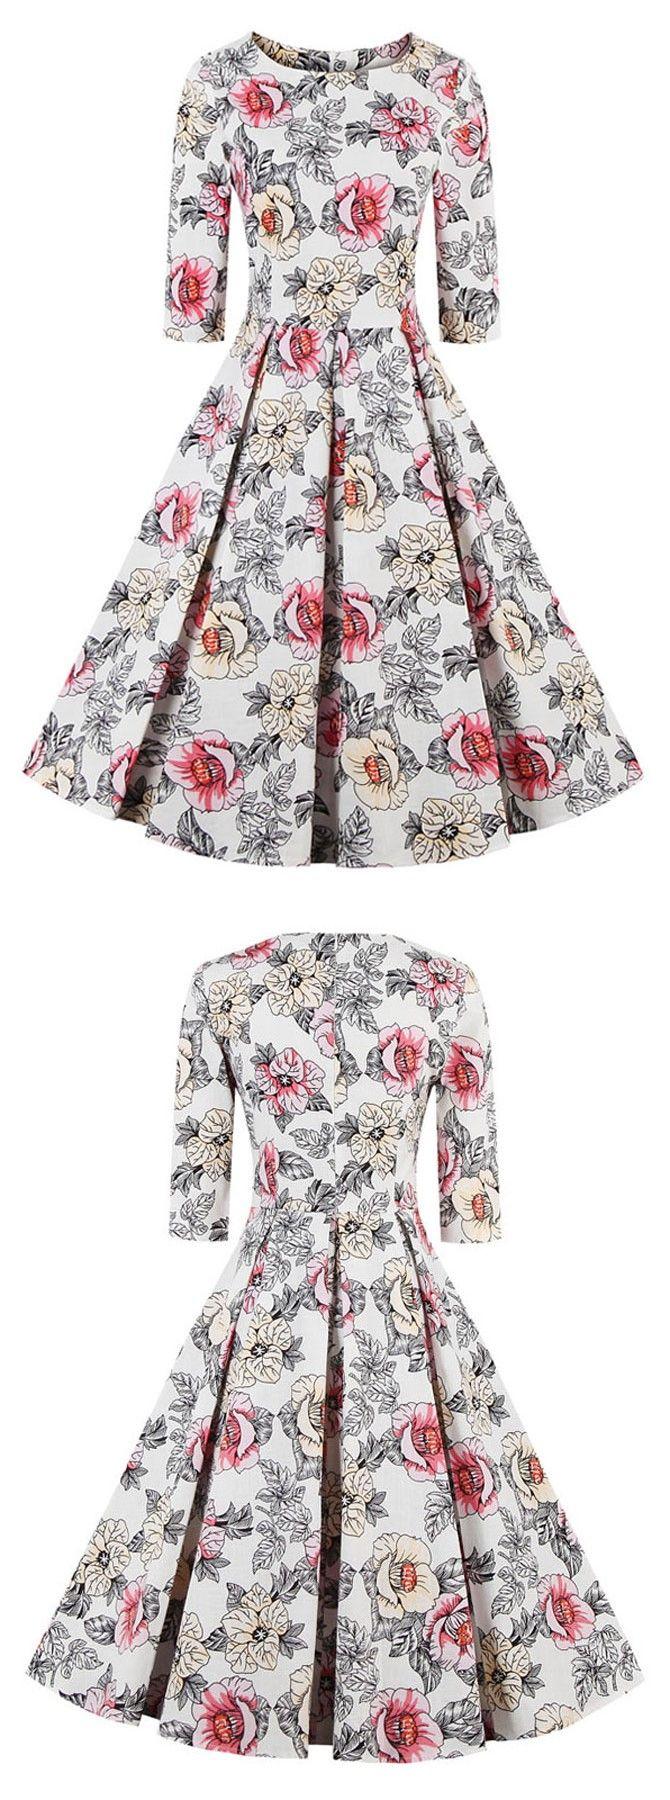 Floral print vintage dress short vintage dress with sleeves s